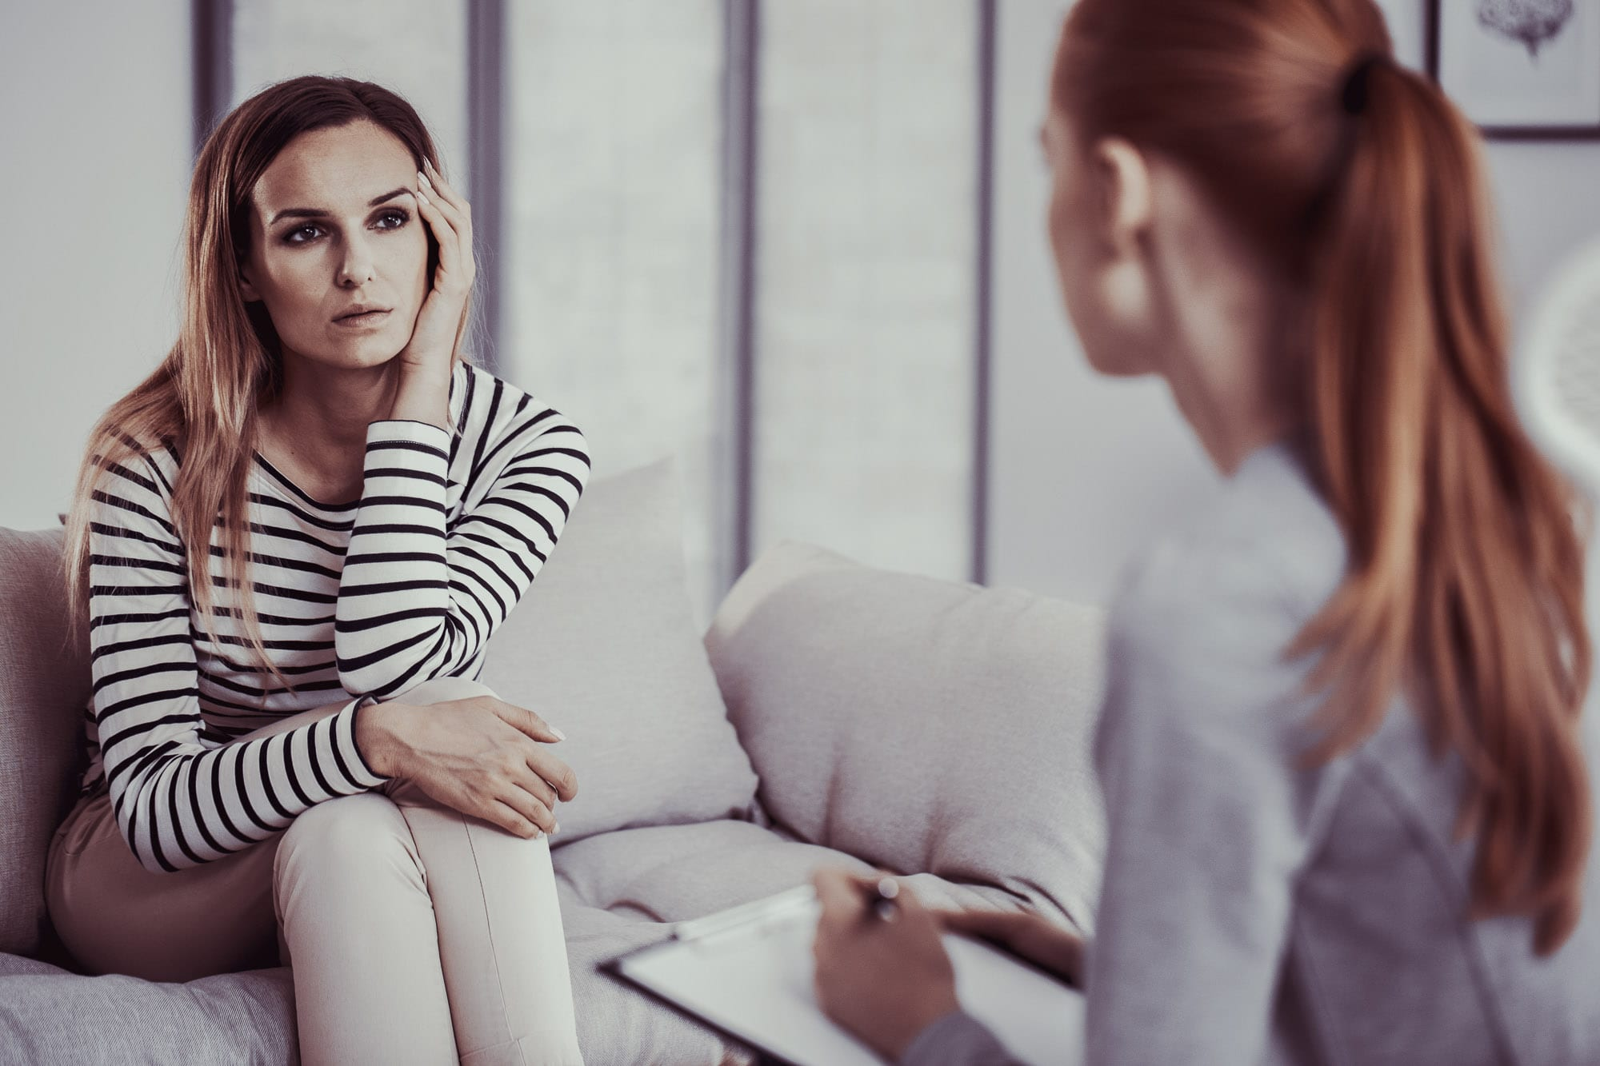 Person with neurodevelopmental disorder